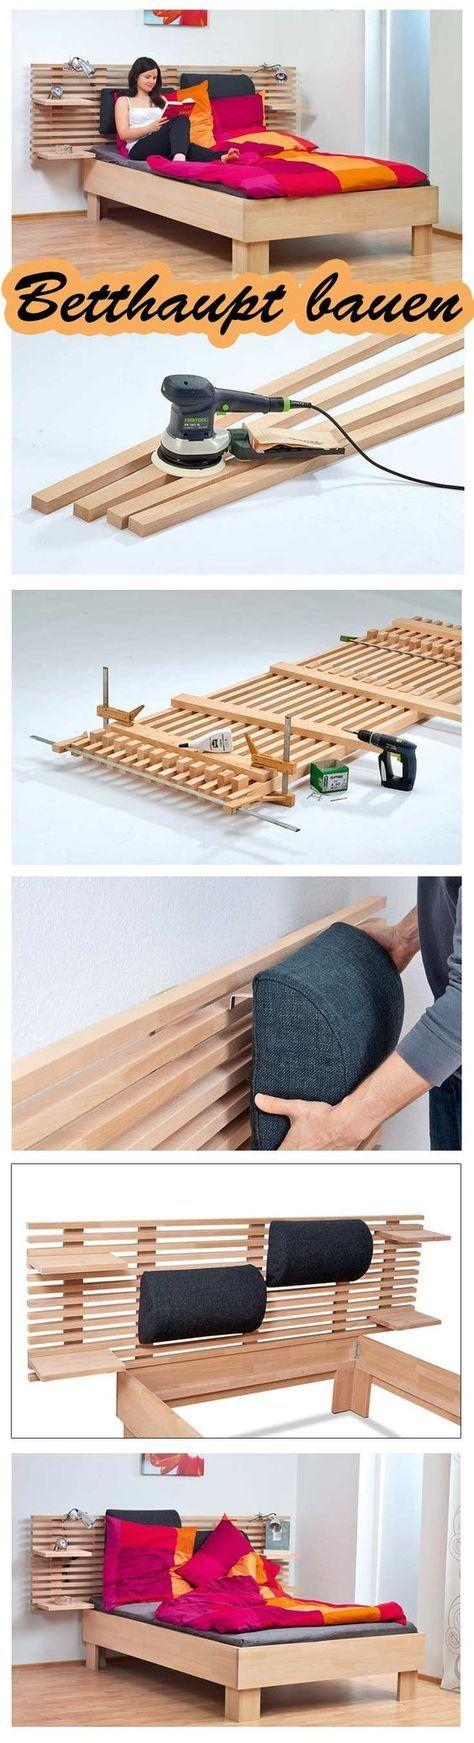 betthaupt bauen selbst bett m bel und bett bauen. Black Bedroom Furniture Sets. Home Design Ideas